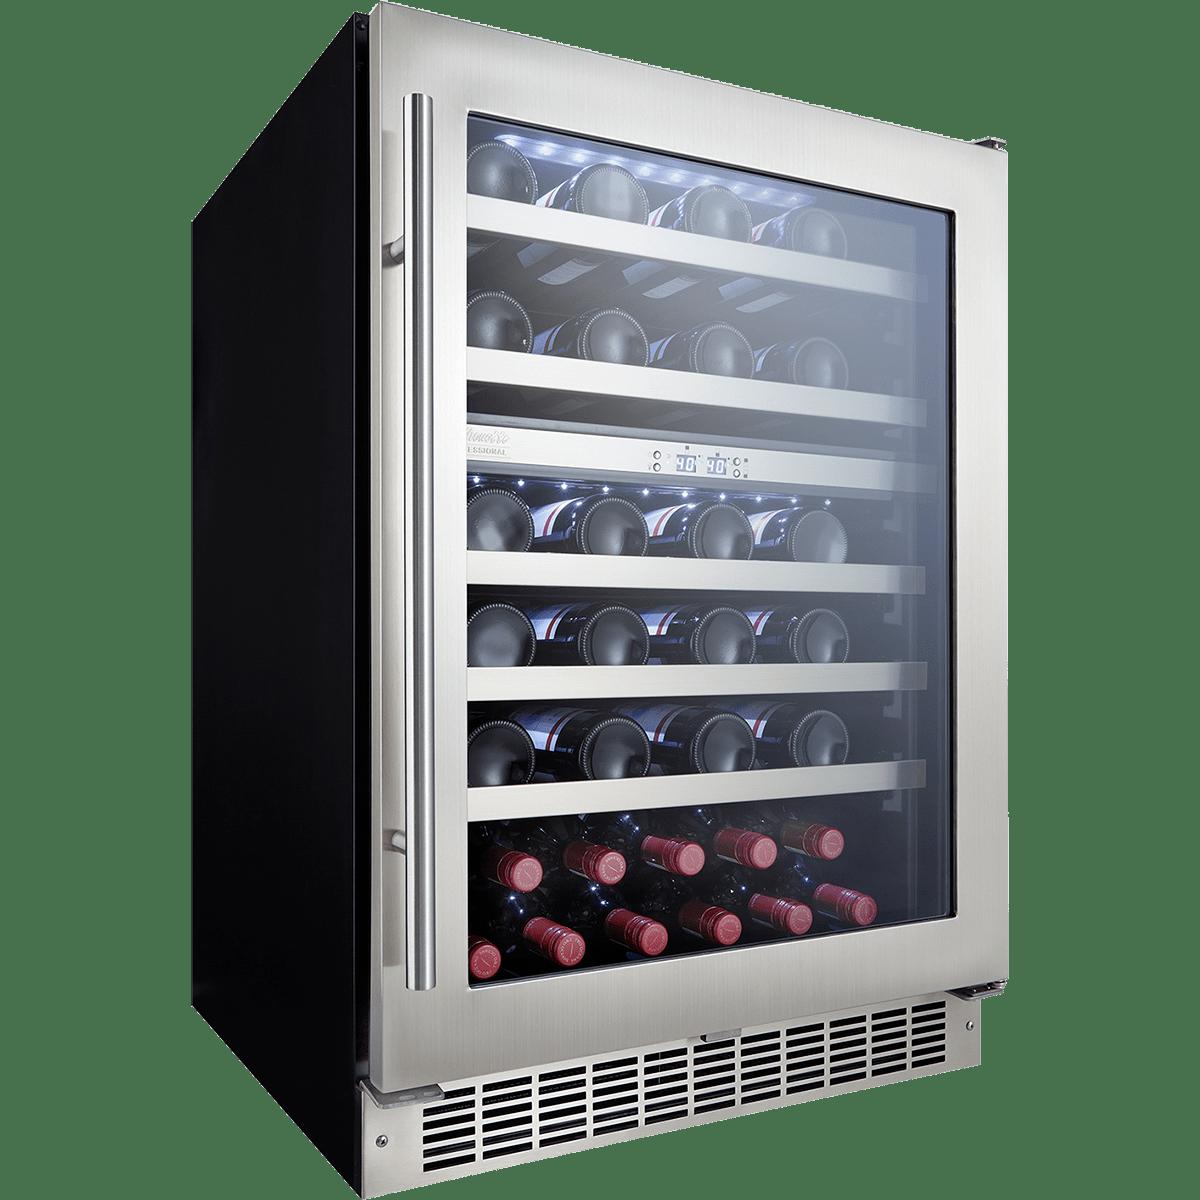 Silhouette Dwc053d1bsspr Sonoma 51 Bottle Wine Cooler